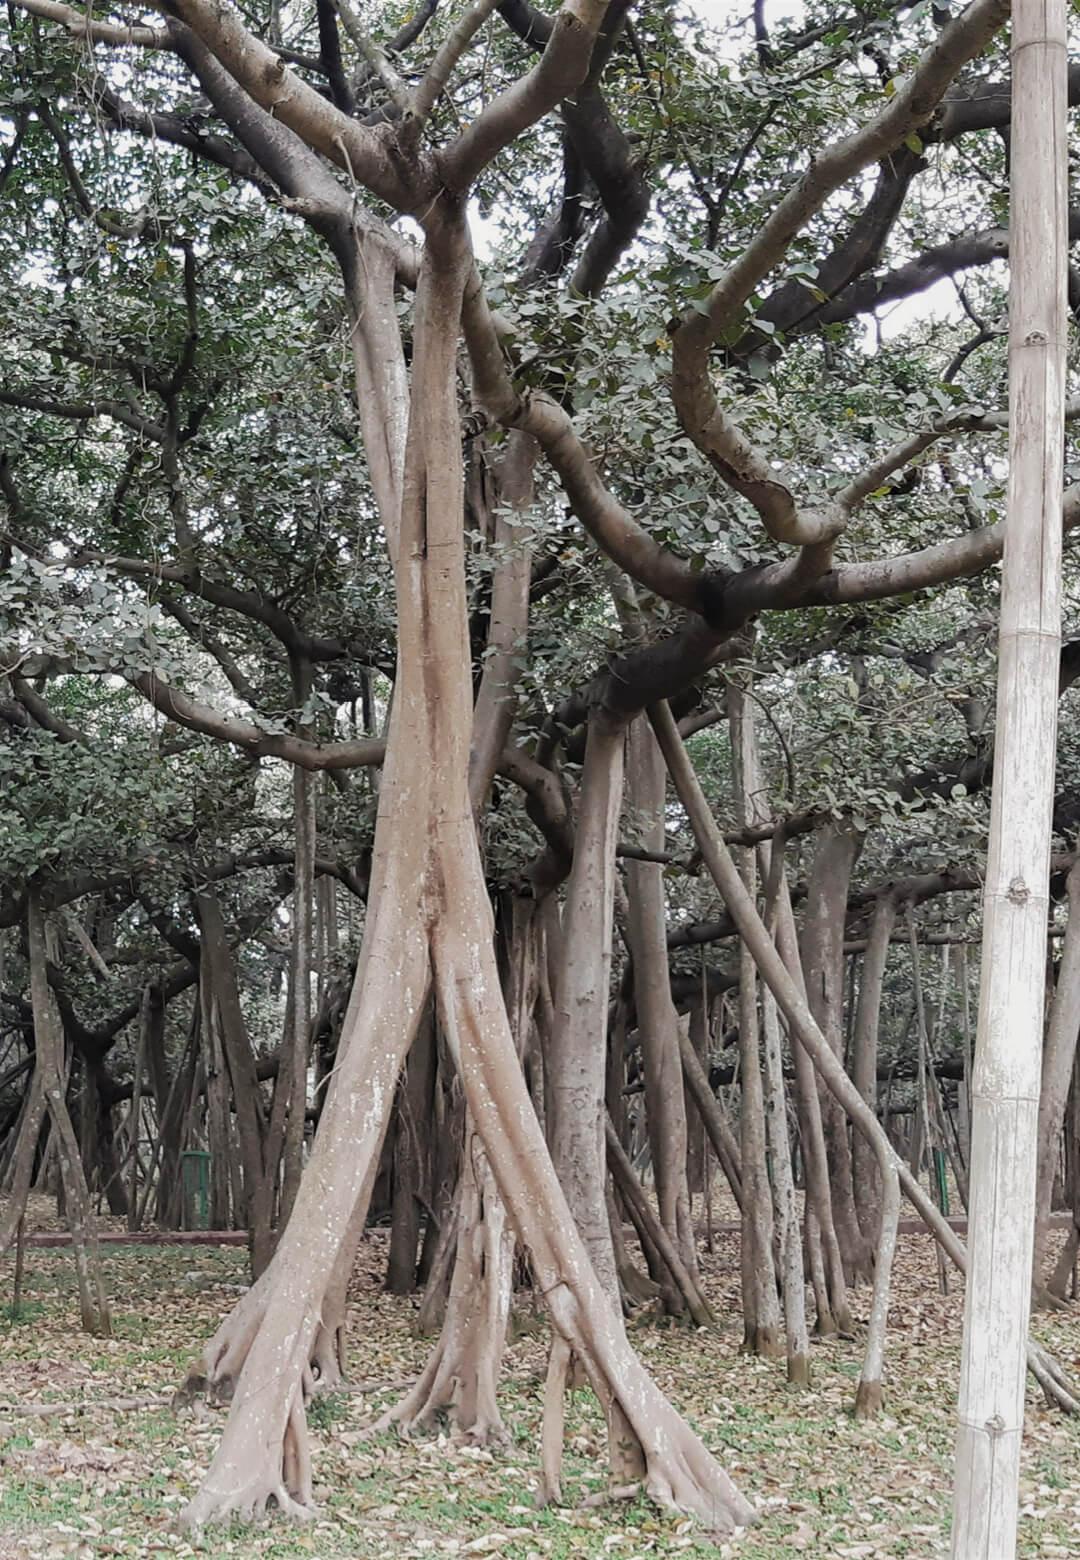 The Great Banyan tree, believed to be at least 1250 years old, is located in Acharya Jagadish Chandra Bose Indian Botanic Garden, Shibpur, Howrah, near Kolkata, India   STIRworld